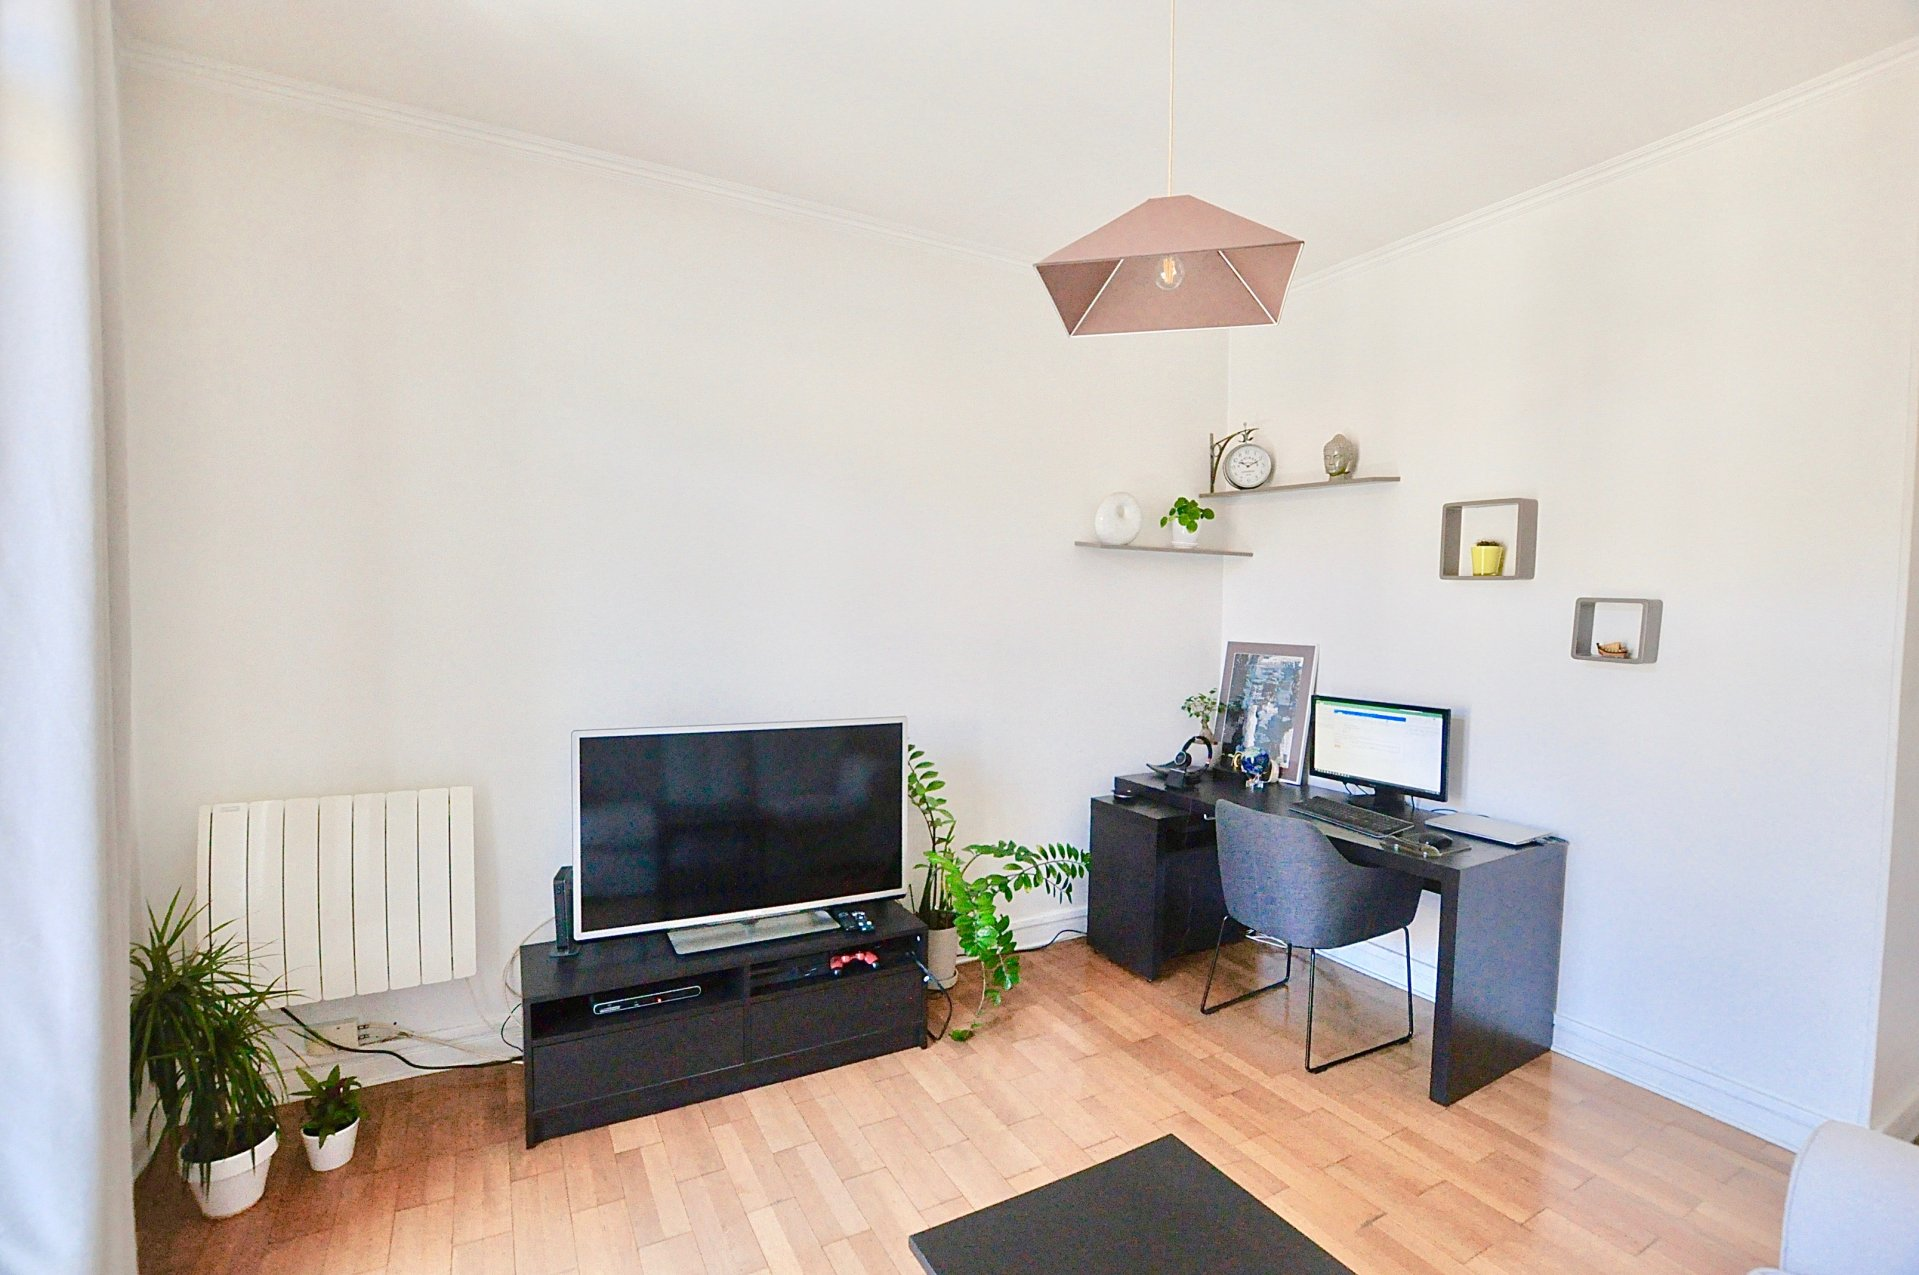 2 pièces Dernier étage  -  Balcon - Nice Riquier